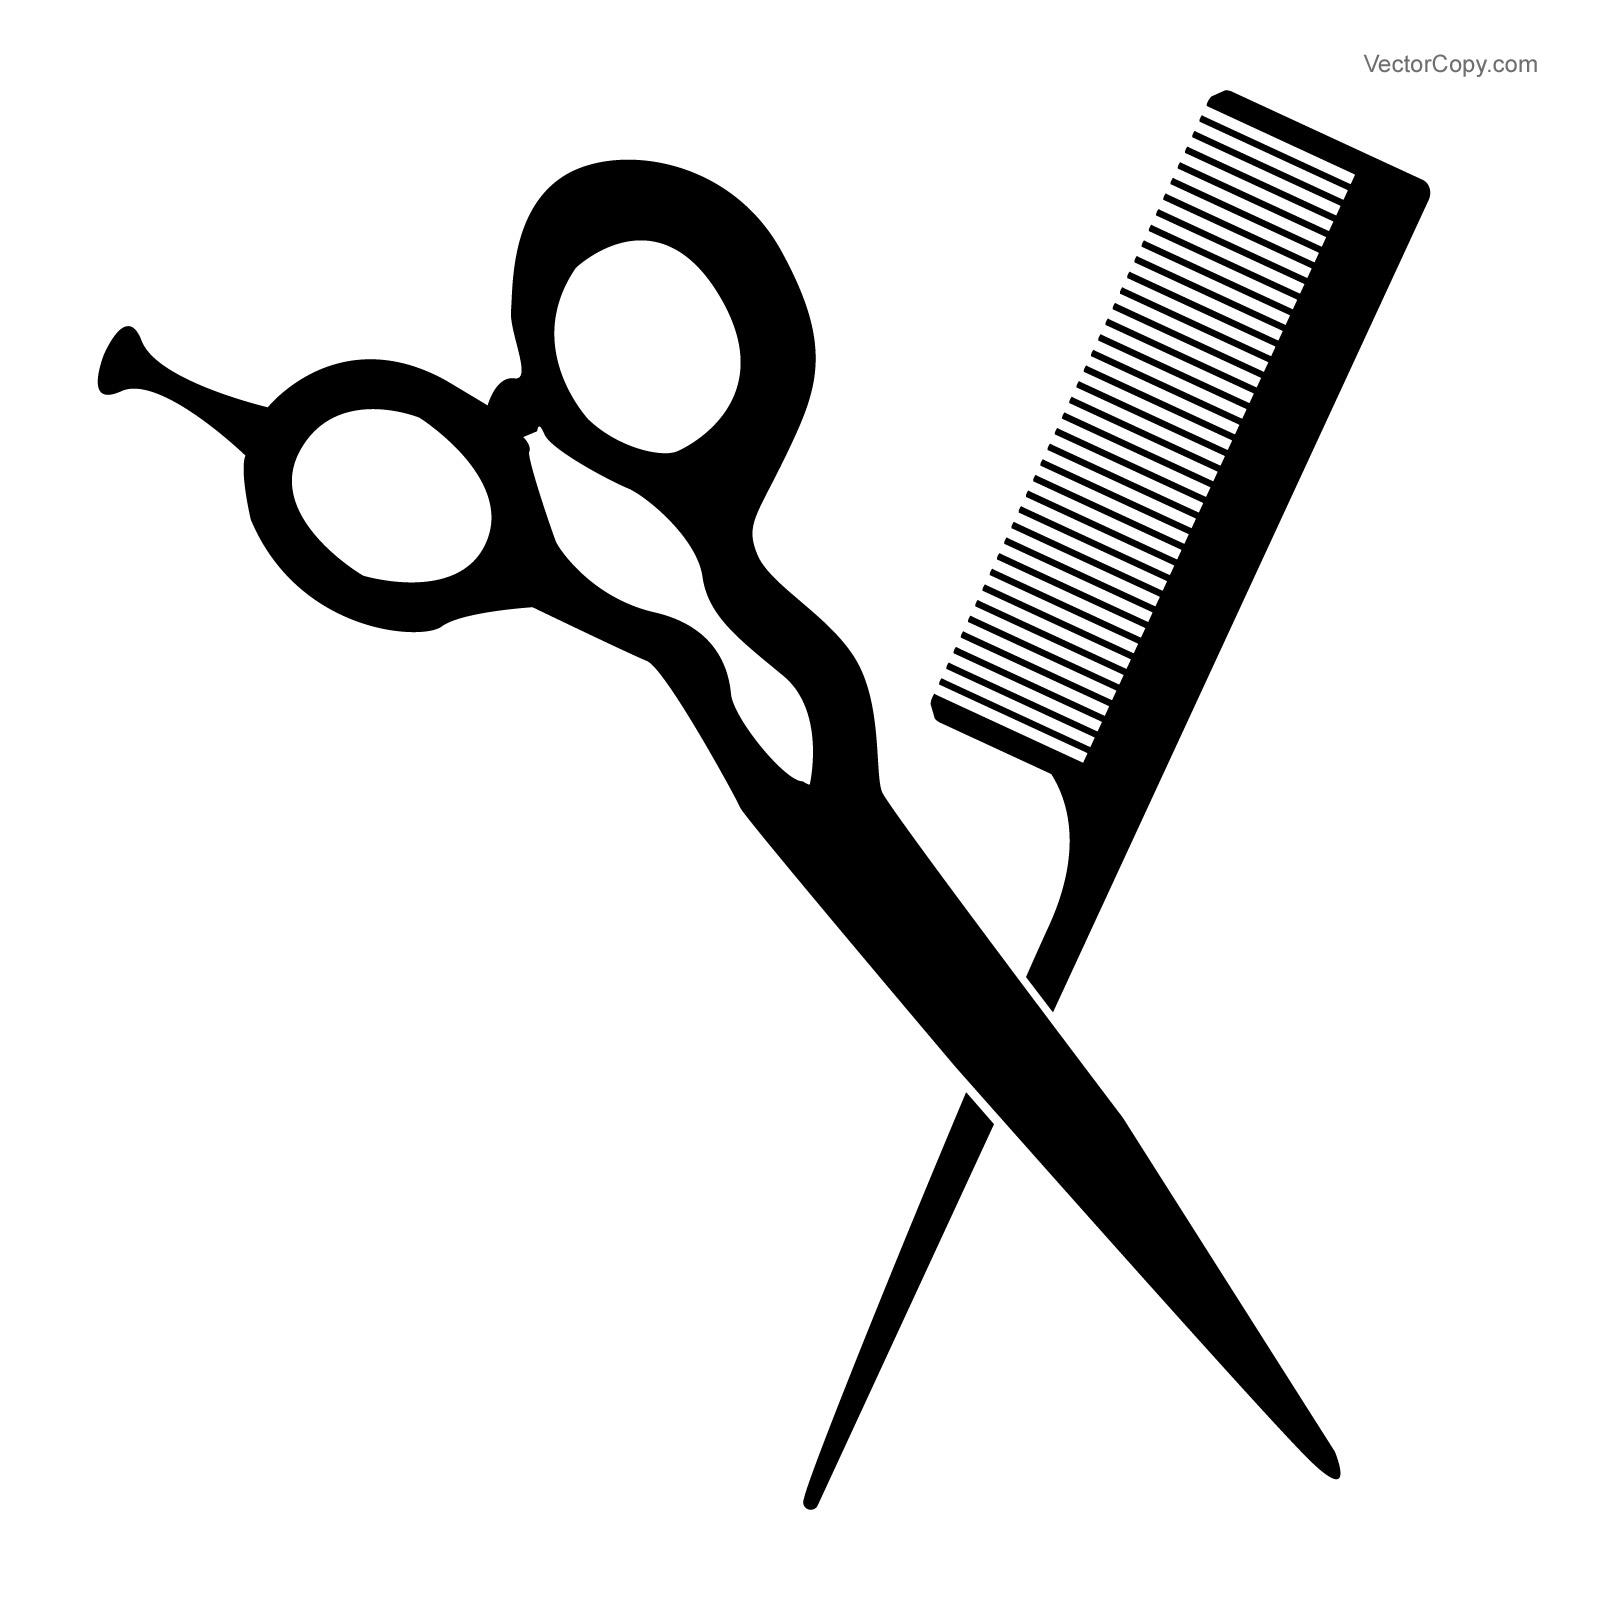 Scissors Clipart Black And White - ClipArt Best